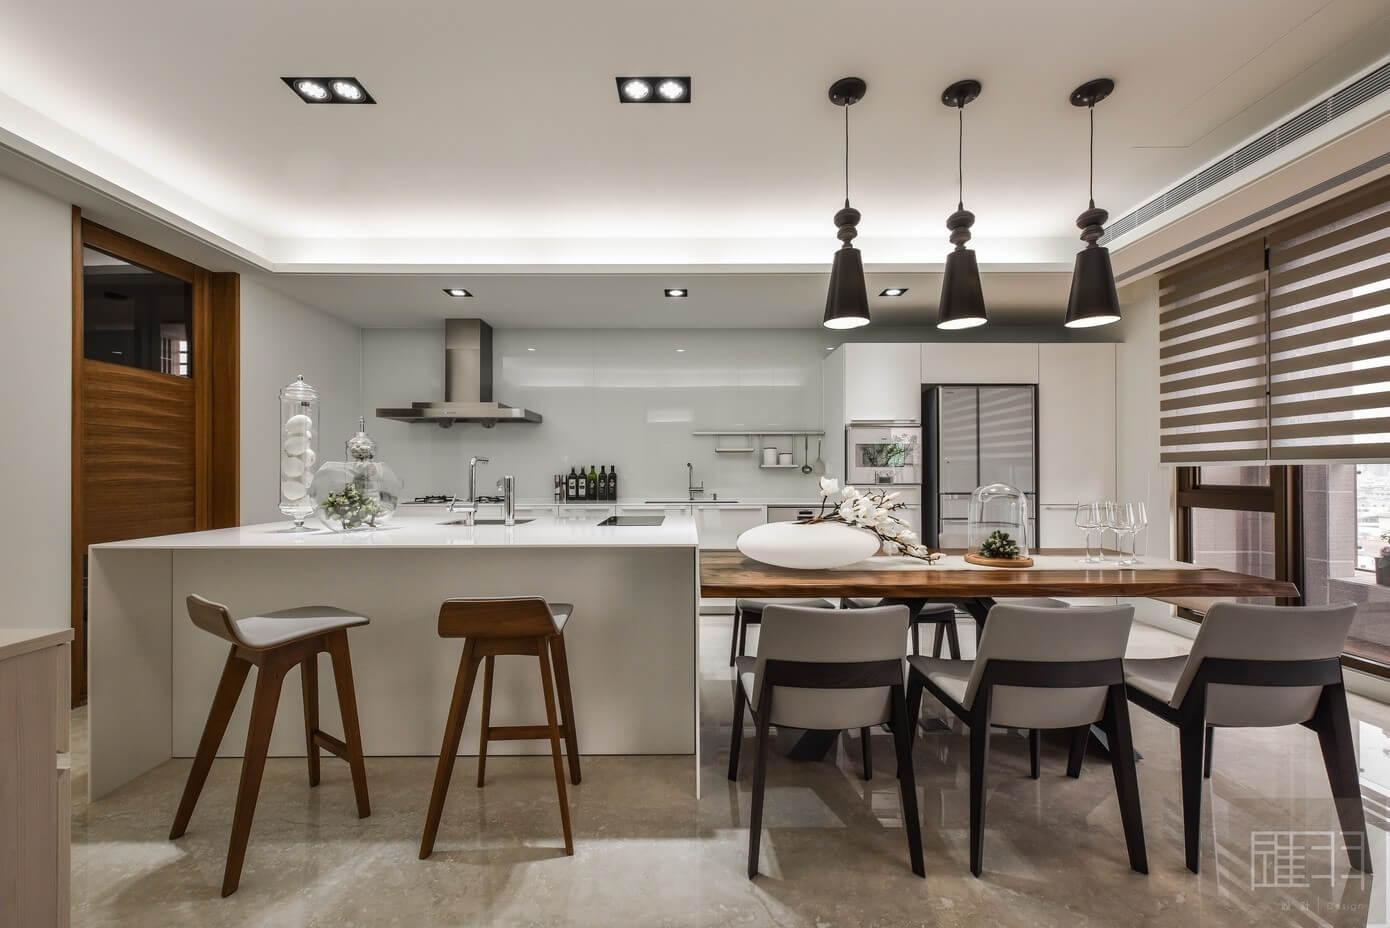 Apartment in Taiwan by Hui-yu Interior Design